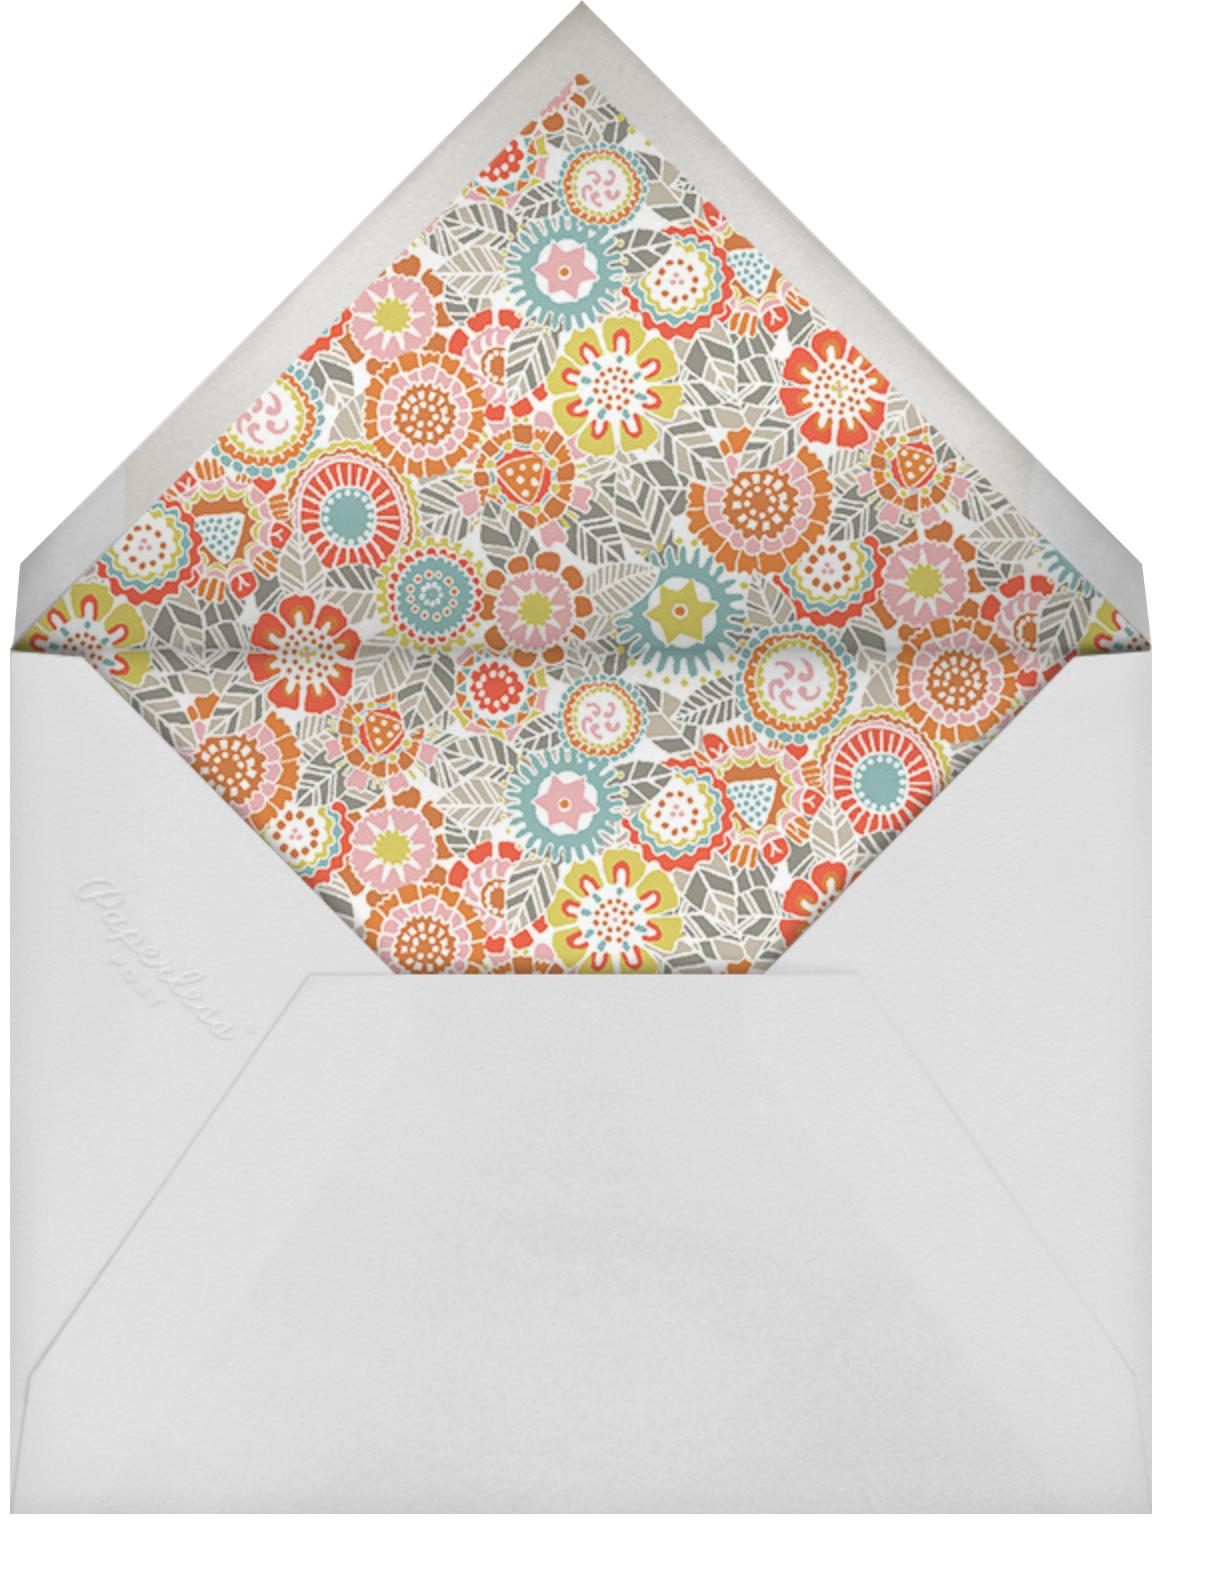 Amelia - Liberty - Adult birthday - envelope back